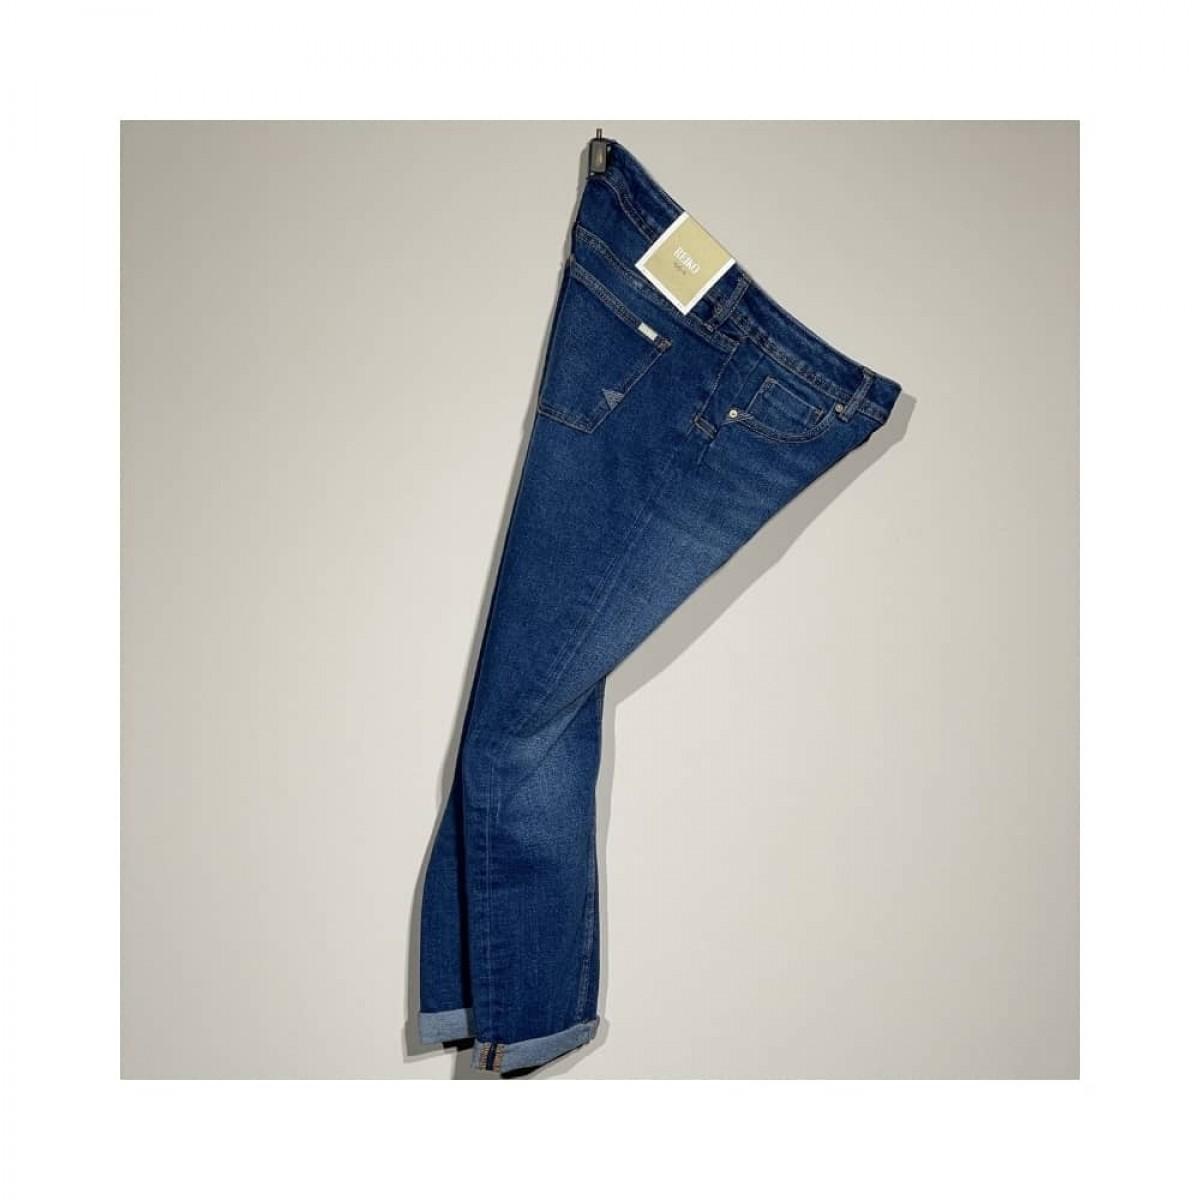 nina boyfriend jeans - blue - fra siden